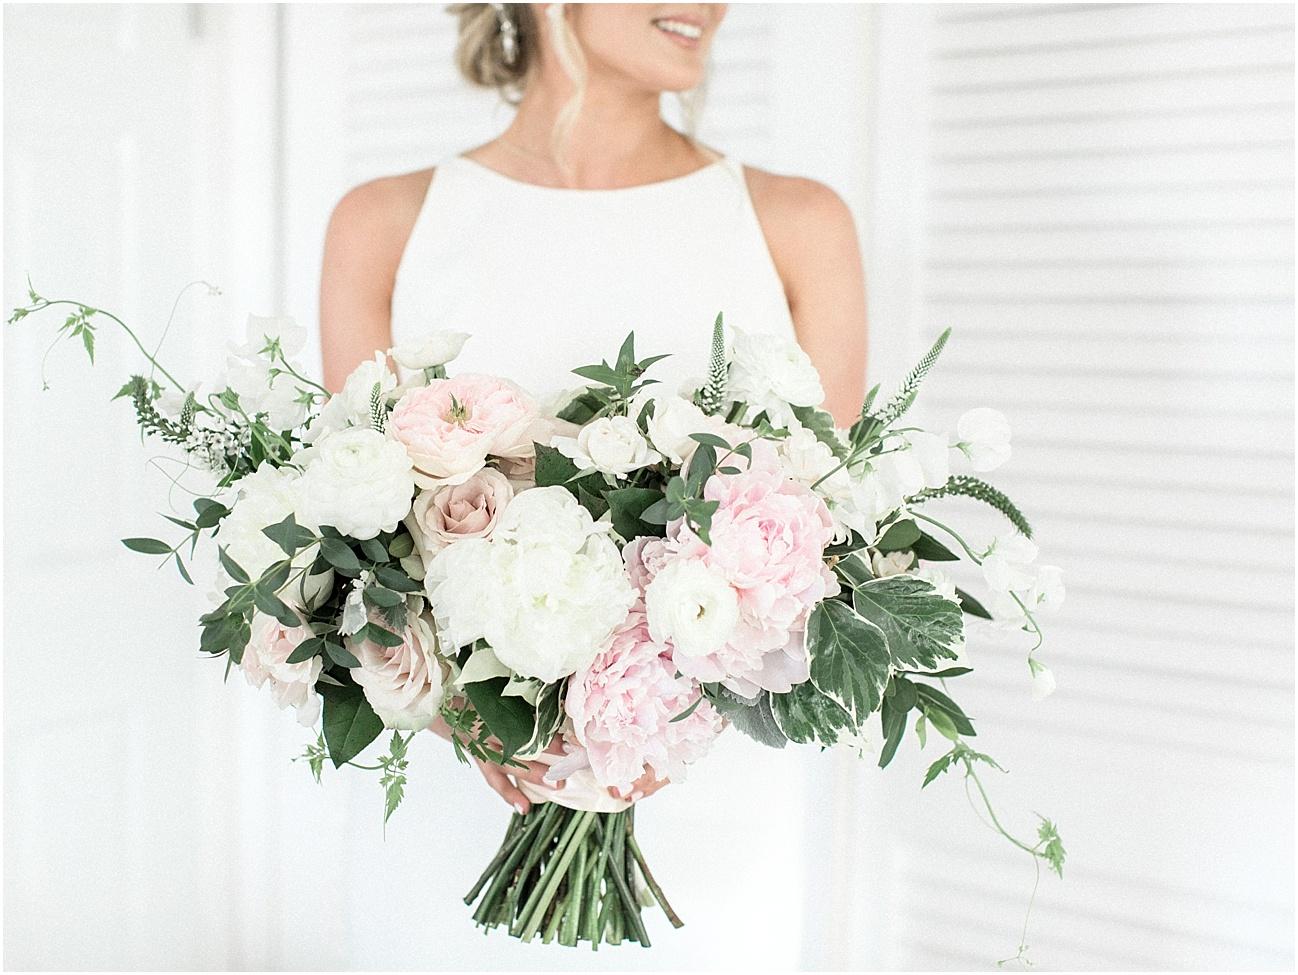 lindsey_paul_indian_pond_country_club_wild_dahlia_brewster_gardens_plymouth_cape_cod_boston_wedding_photographer_meredith_jane_photography_photo_0414.jpg